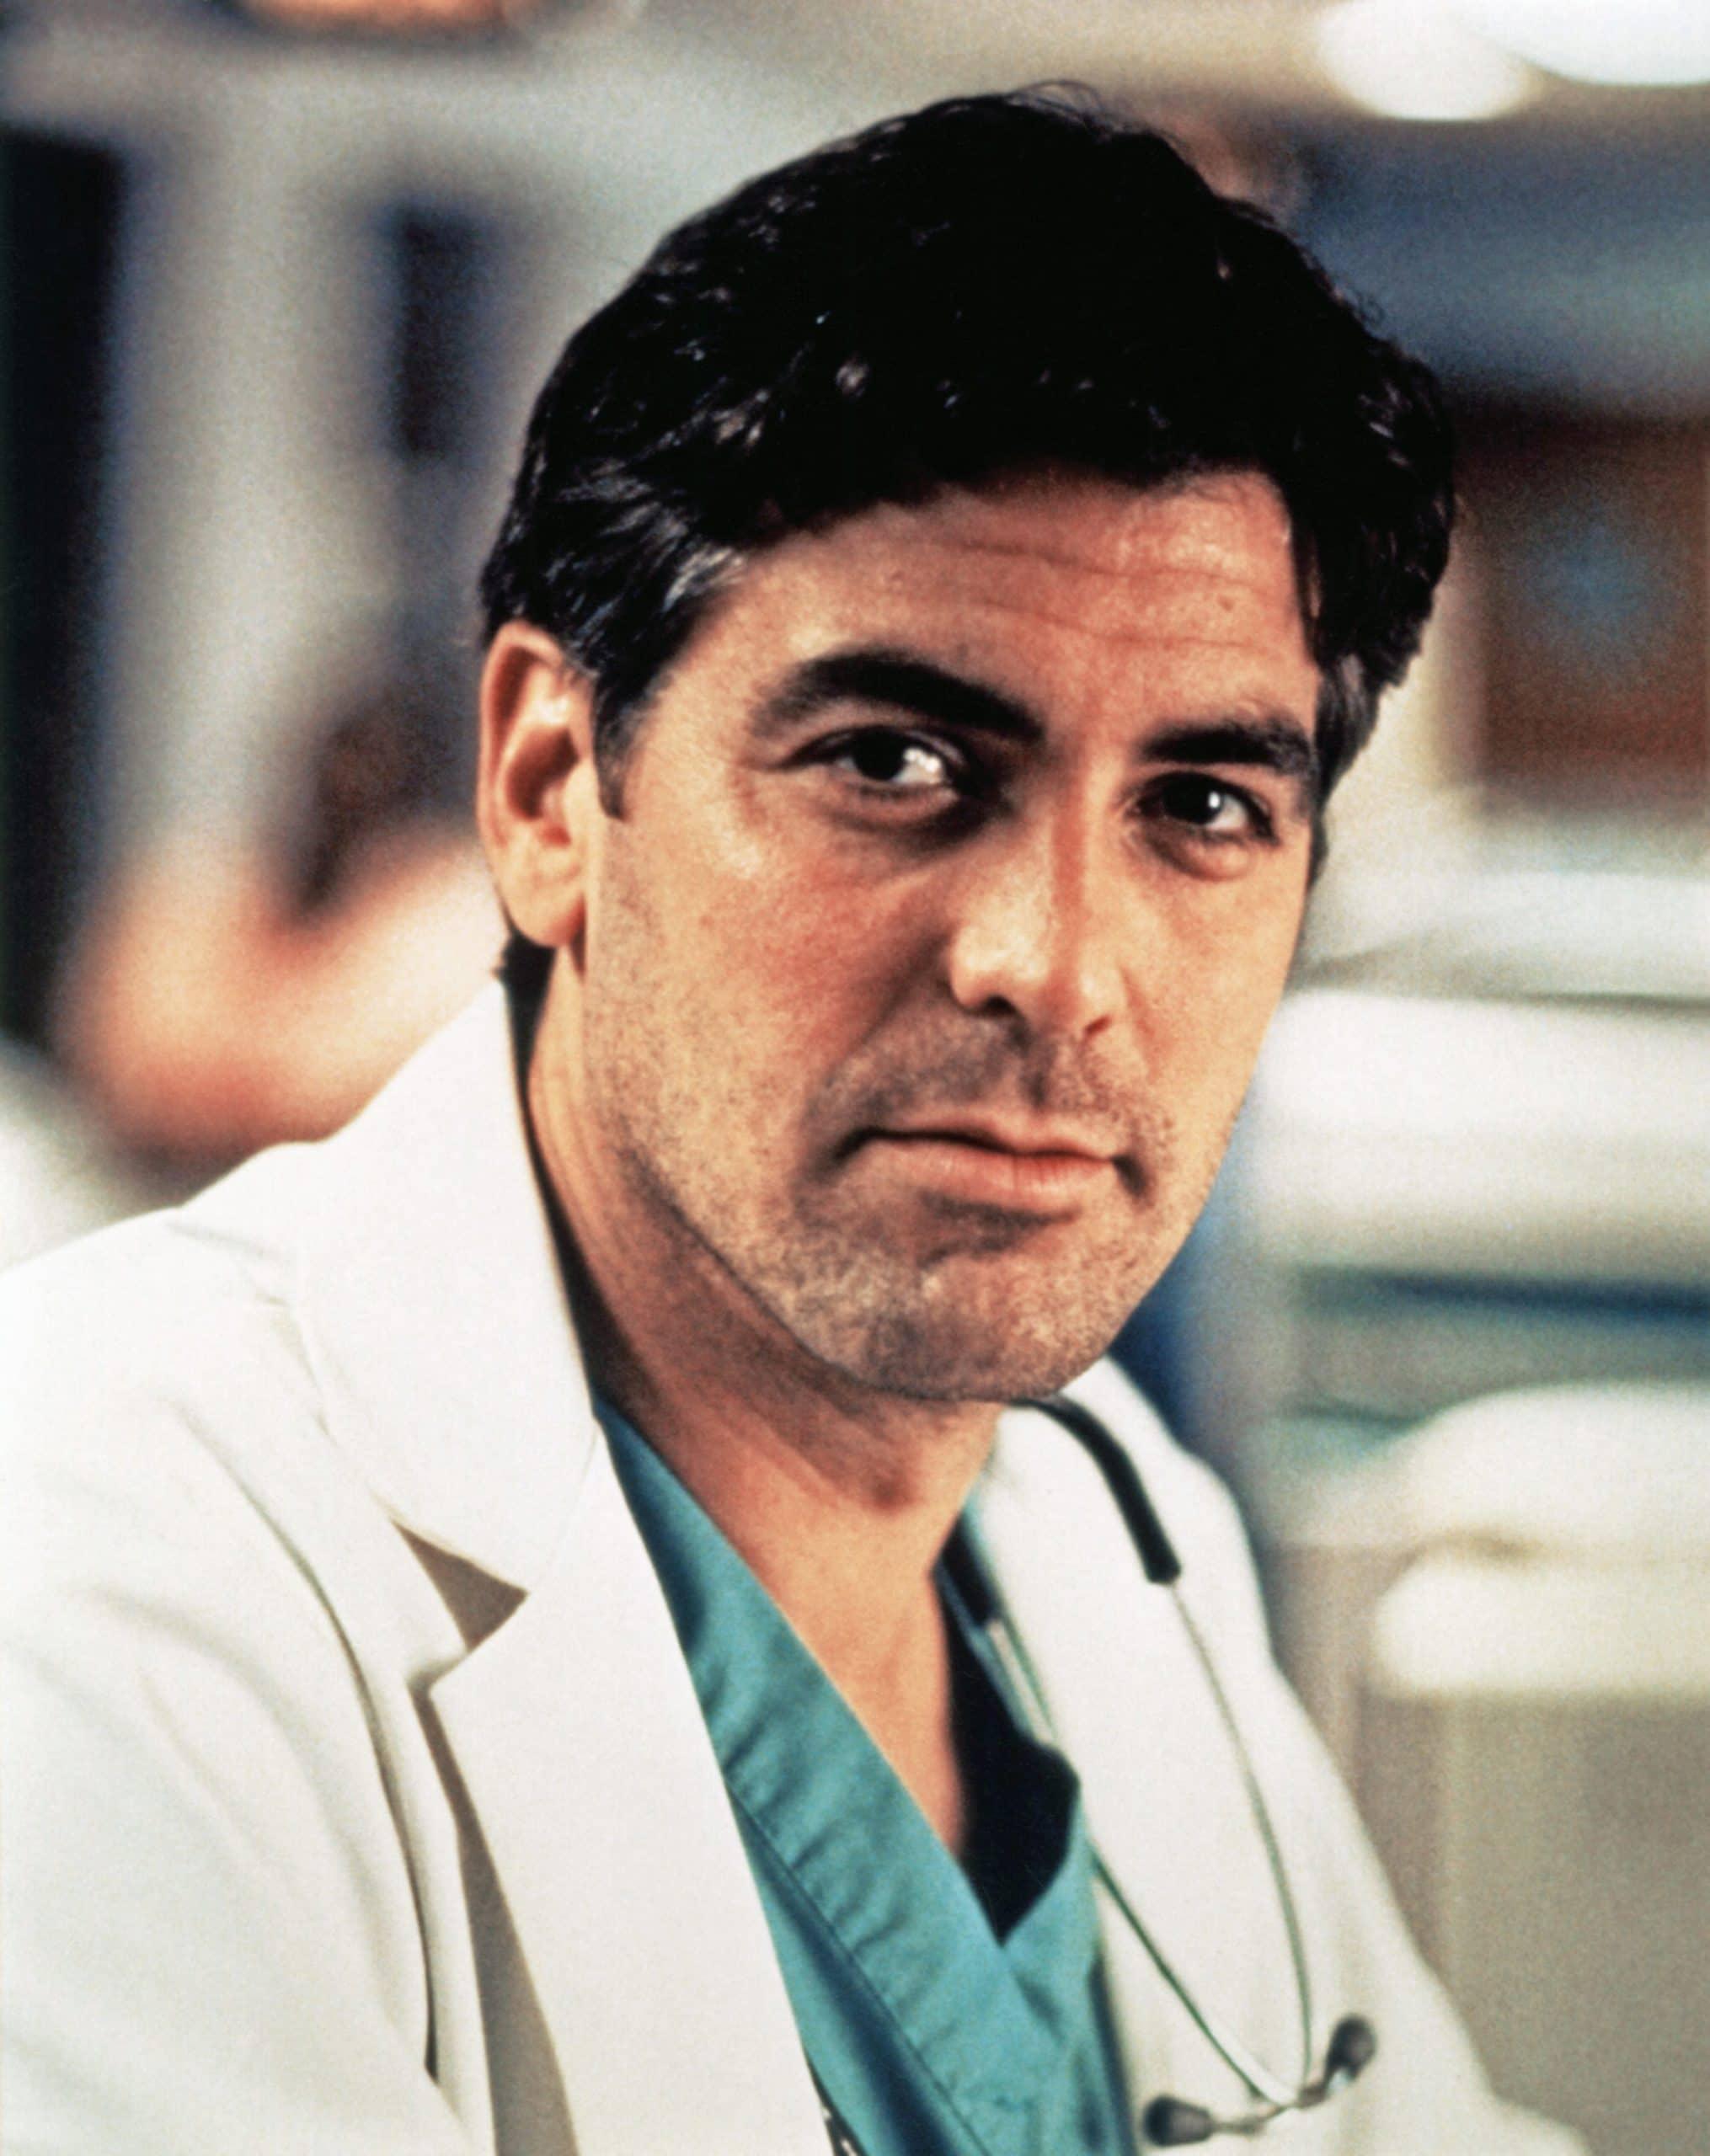 E.R., George Clooney, 1994-2009